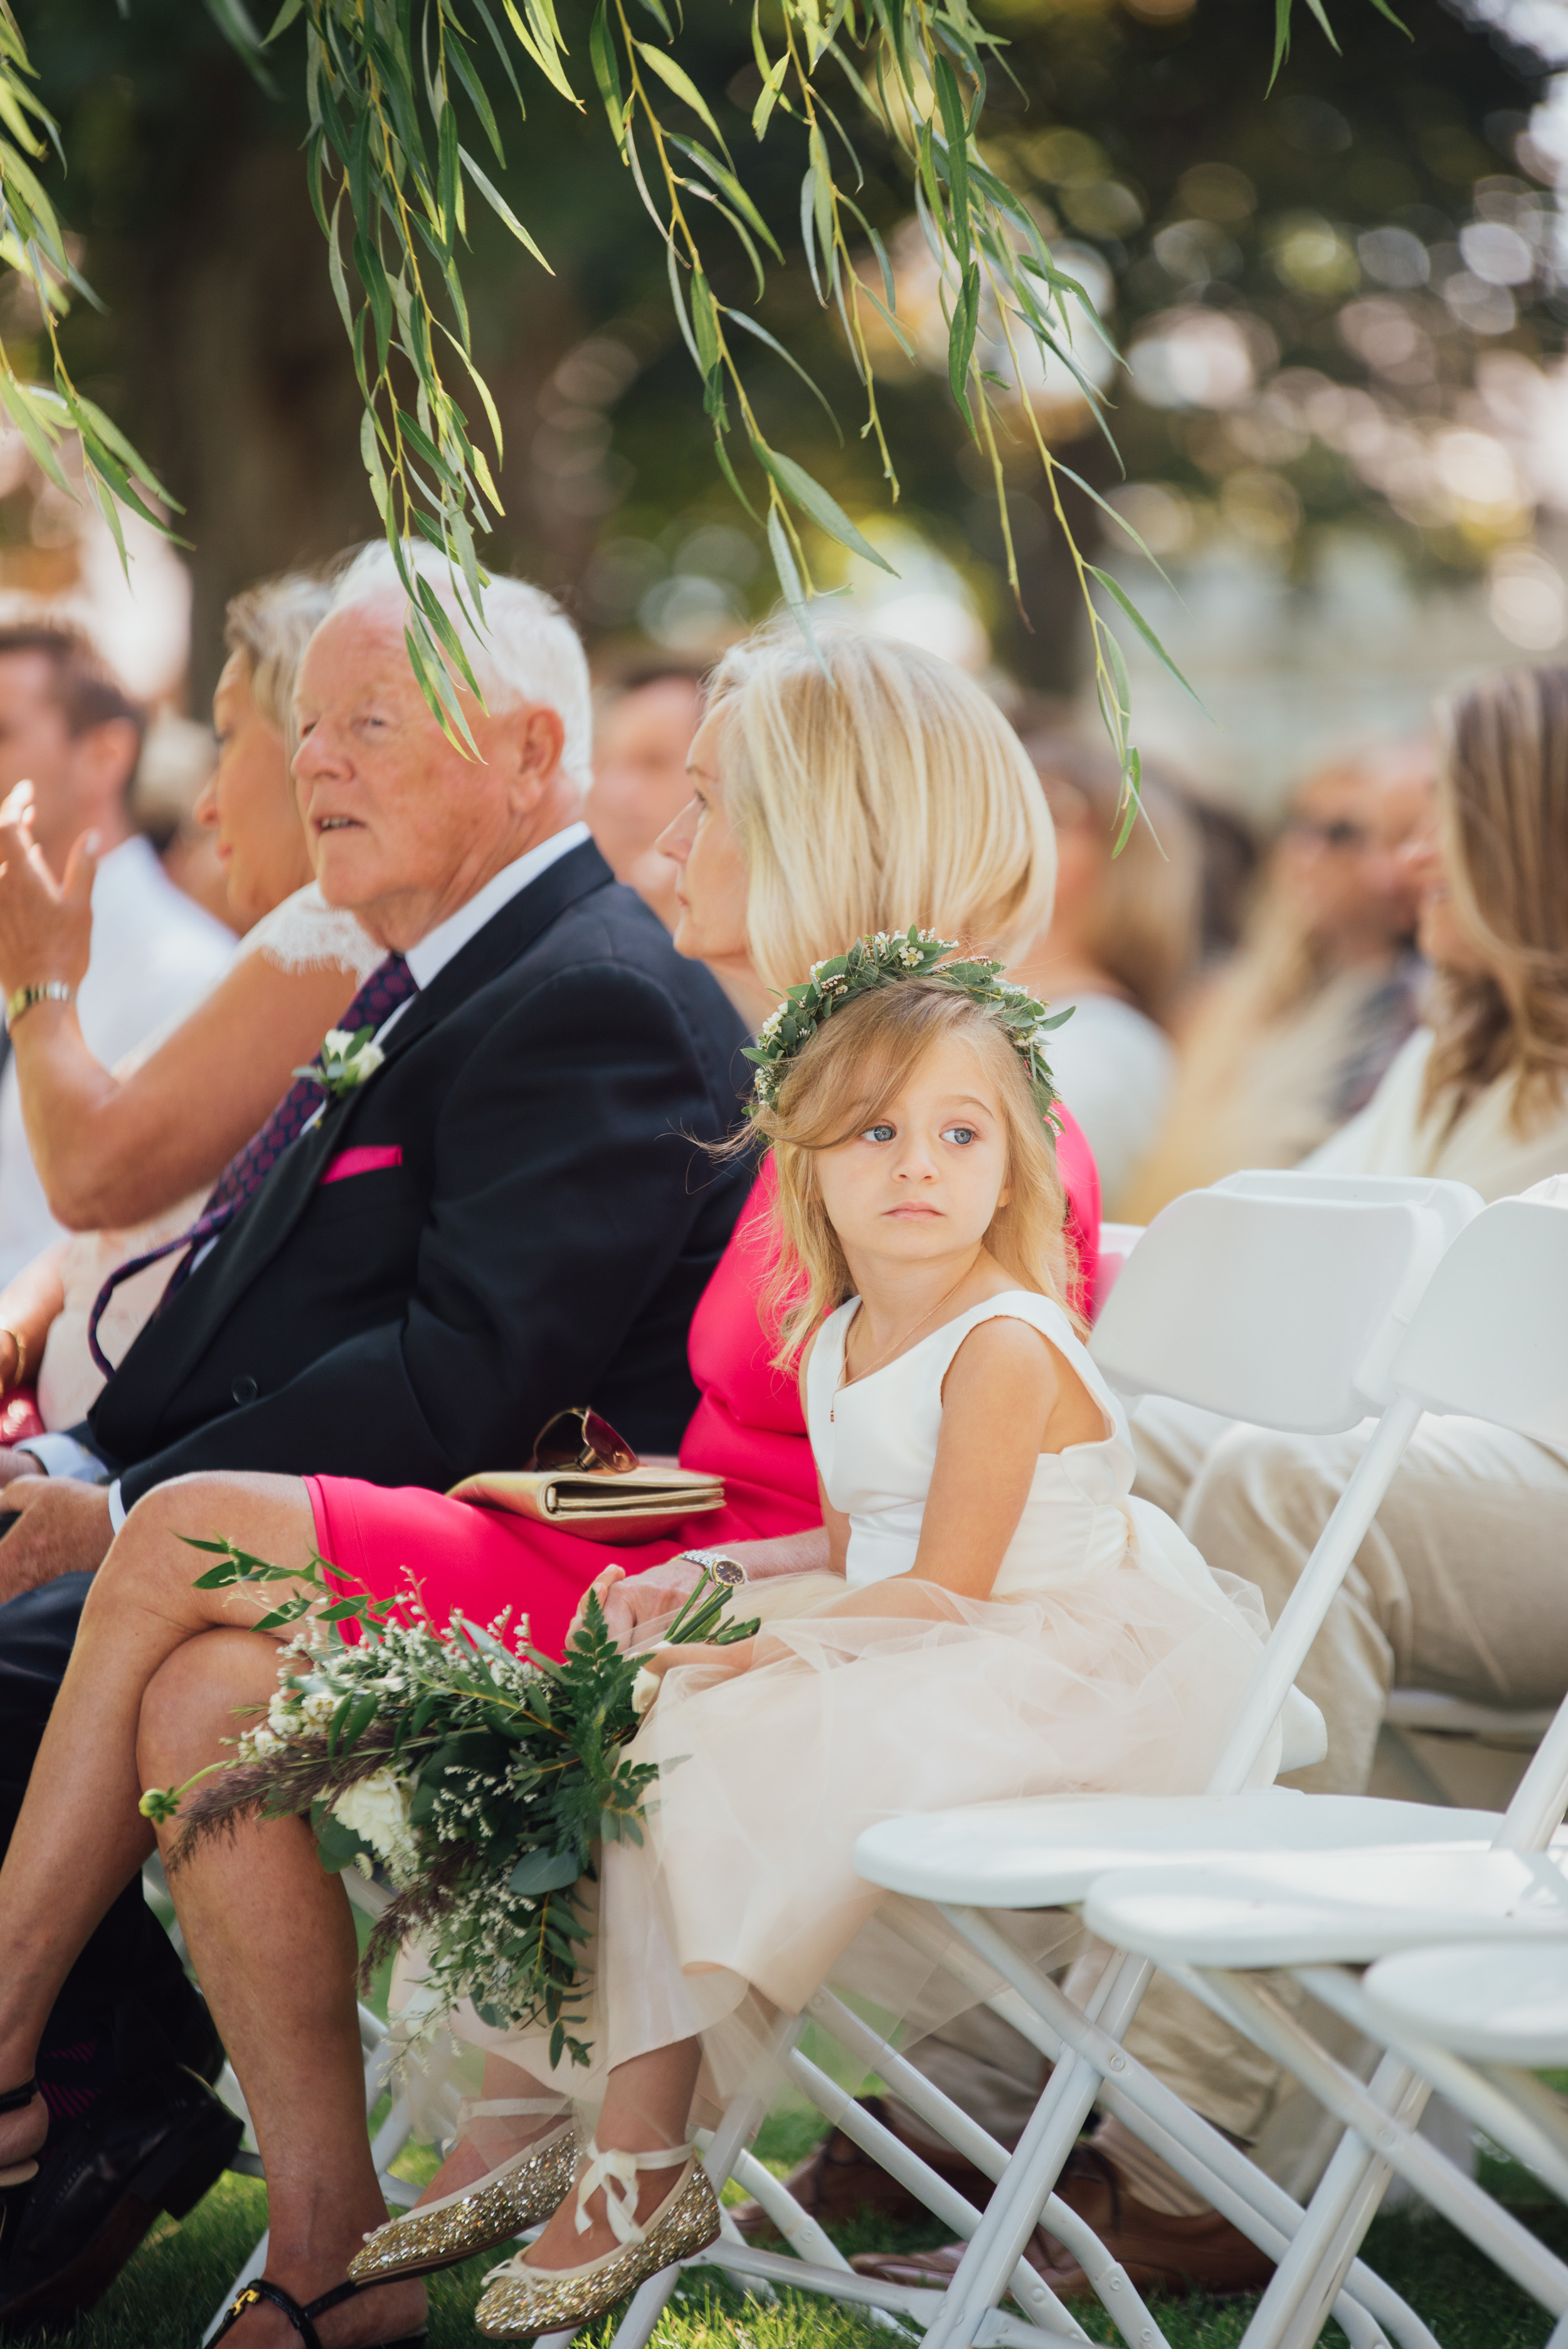 cleland-studios-wedding-photography-34.jpg